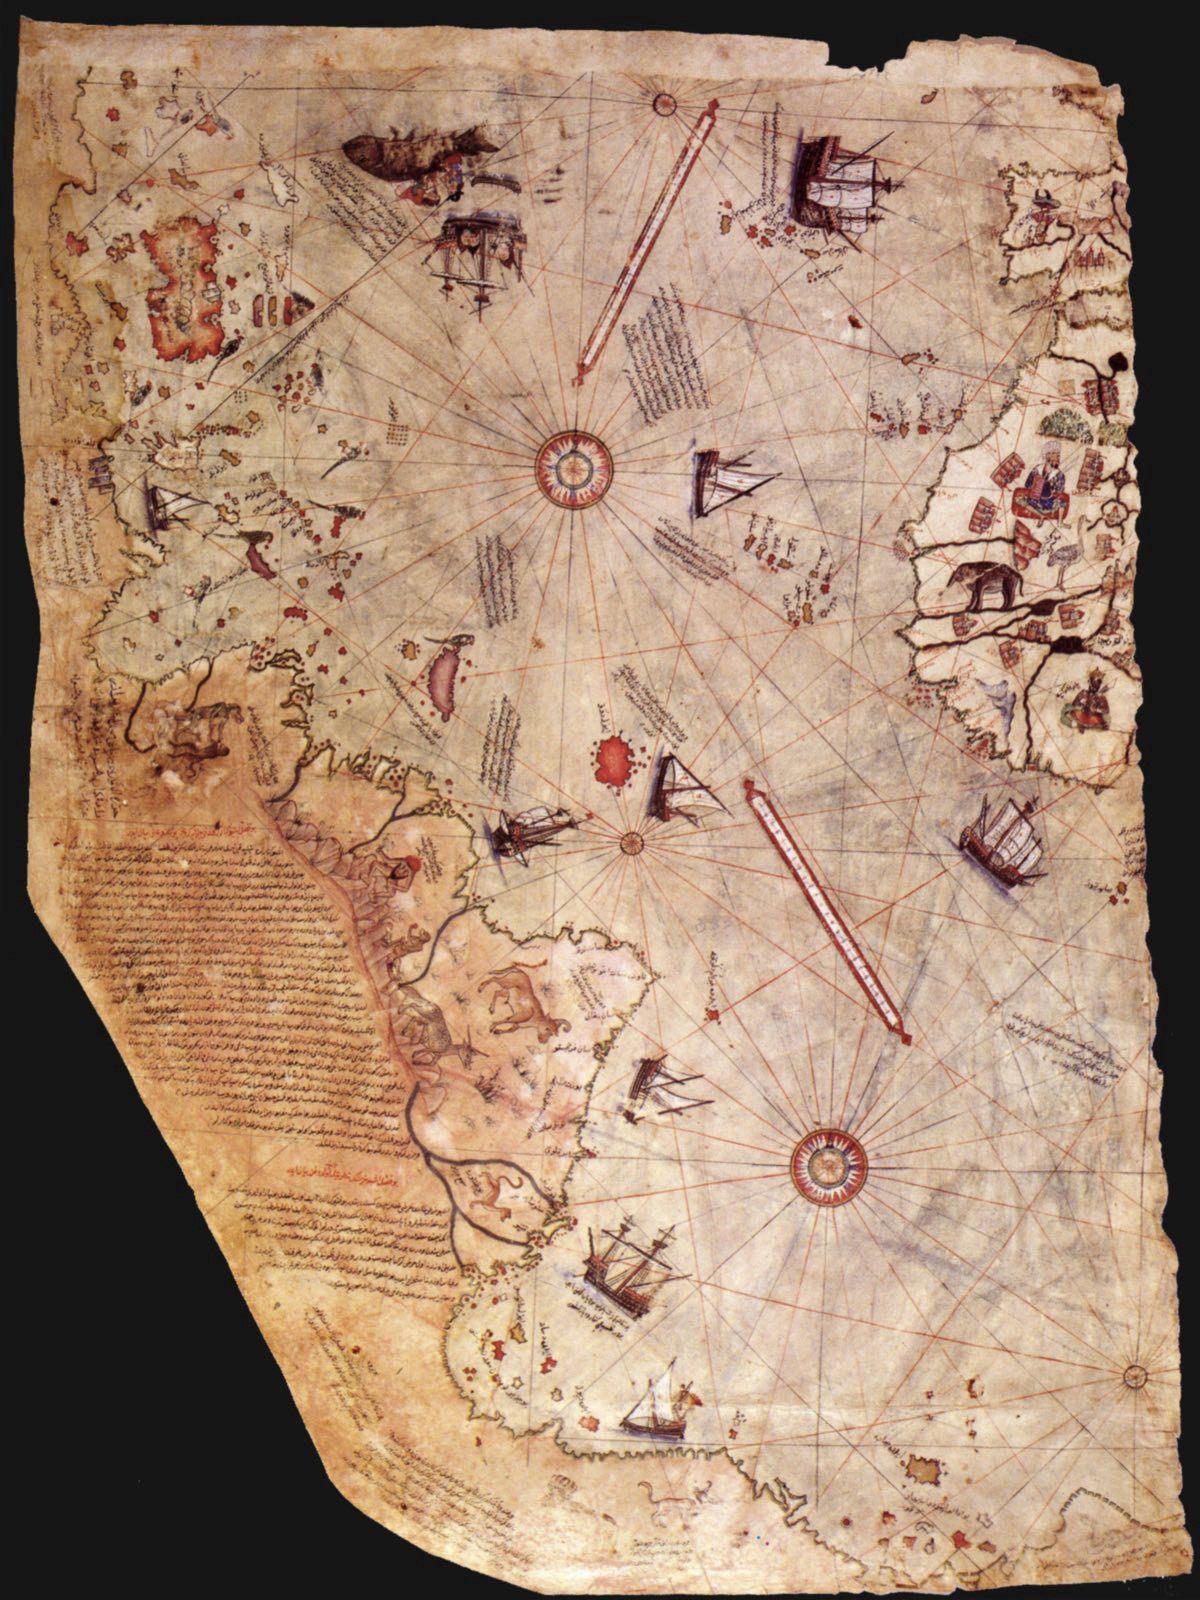 Does the Piri Reis map show the coast of Antarctica?